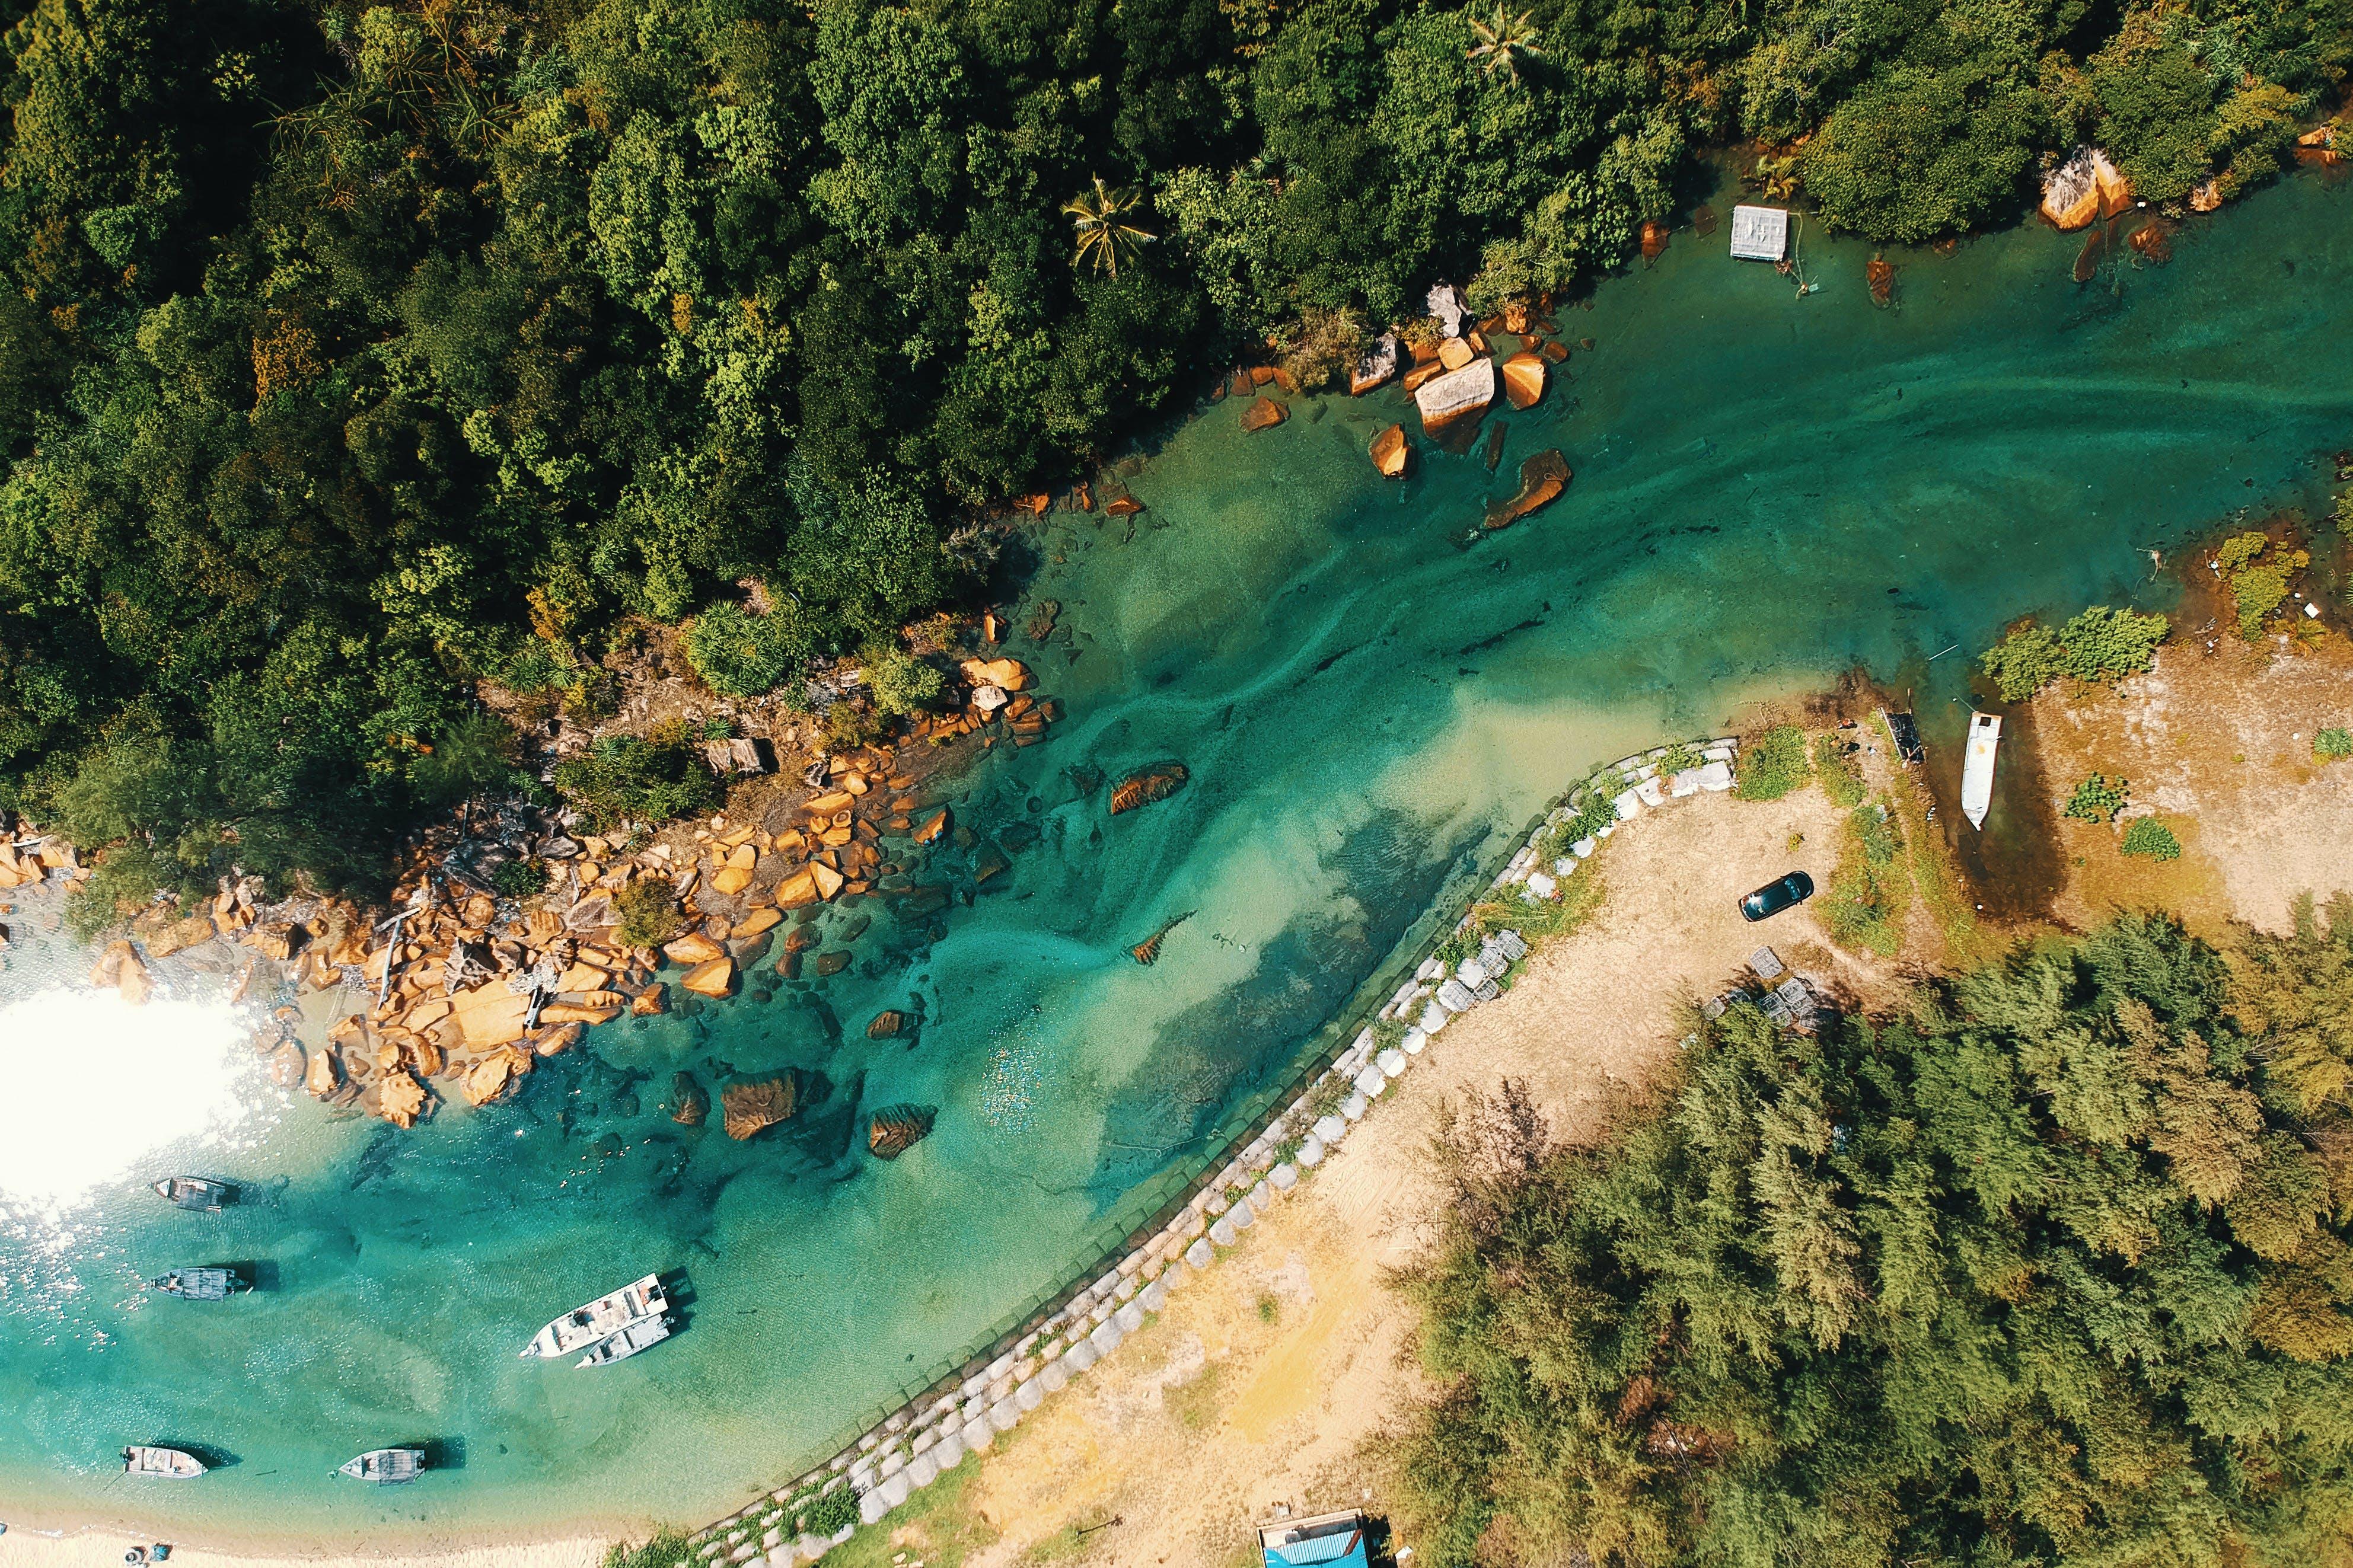 River Aerial Photo